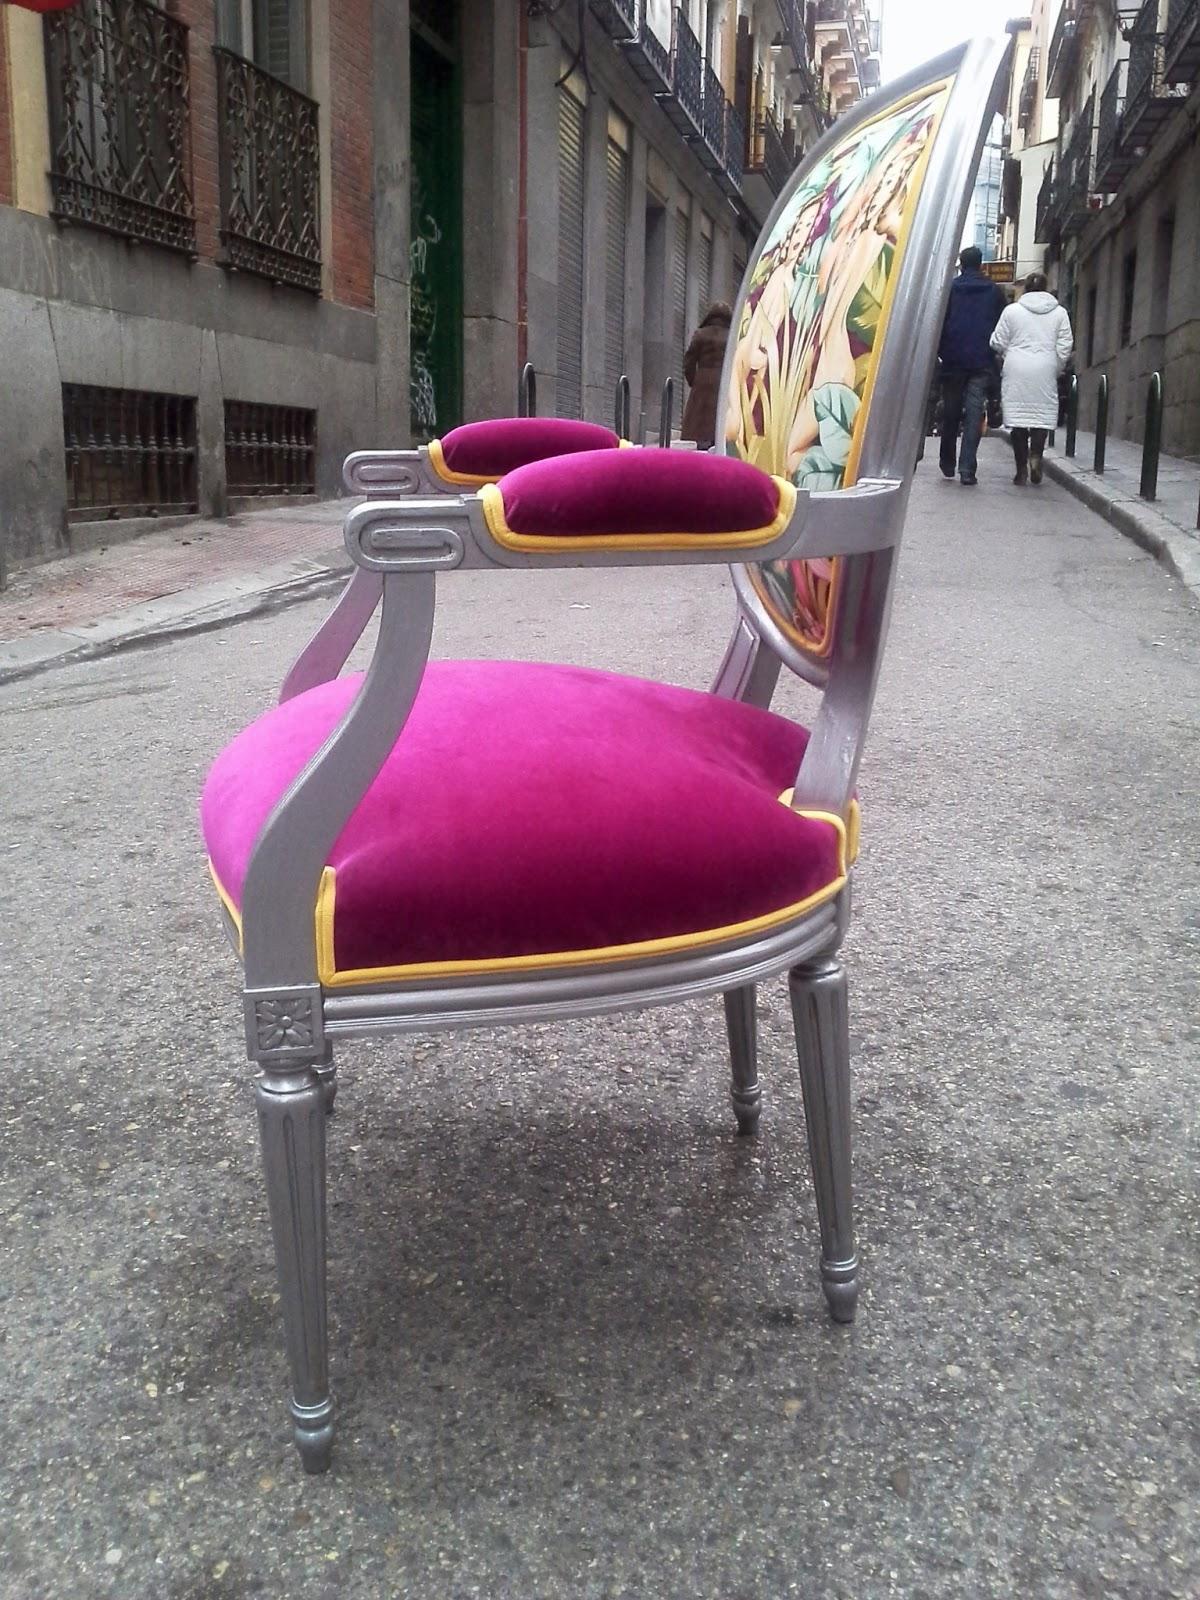 La tapicera silla luis xvi tapizada con tela de pin ups - Sillas luis xvi baratas ...